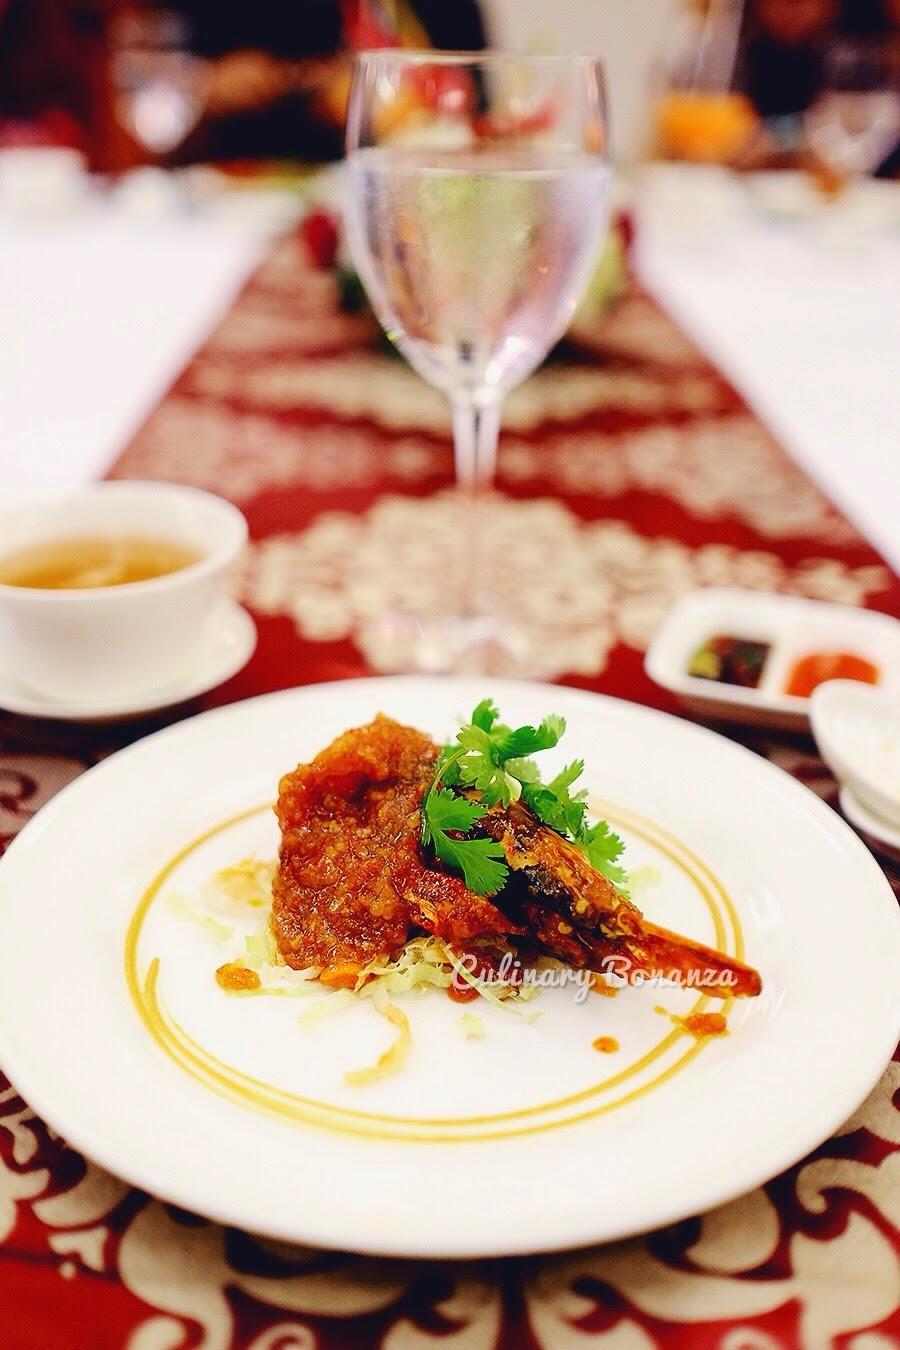 Wok-fried King Prawn with Ginger Spicy Sauce (www.culinarybonanza.com)